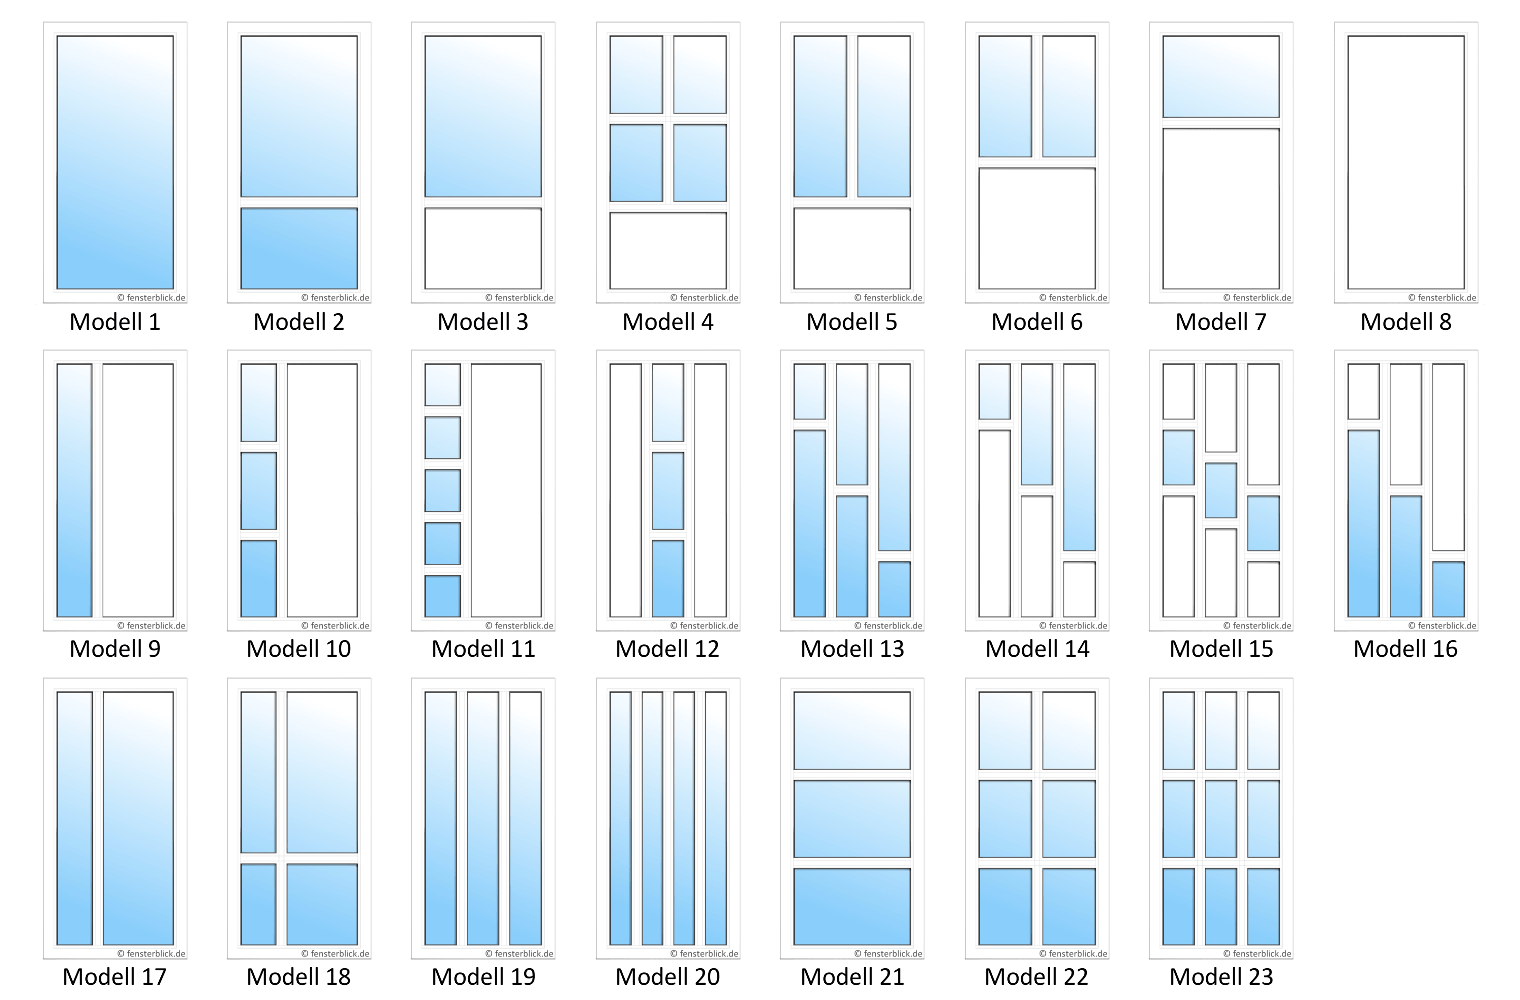 Extrem Nebeneingangstüren Farben: Große Auswahl - fensterblick.de DU16